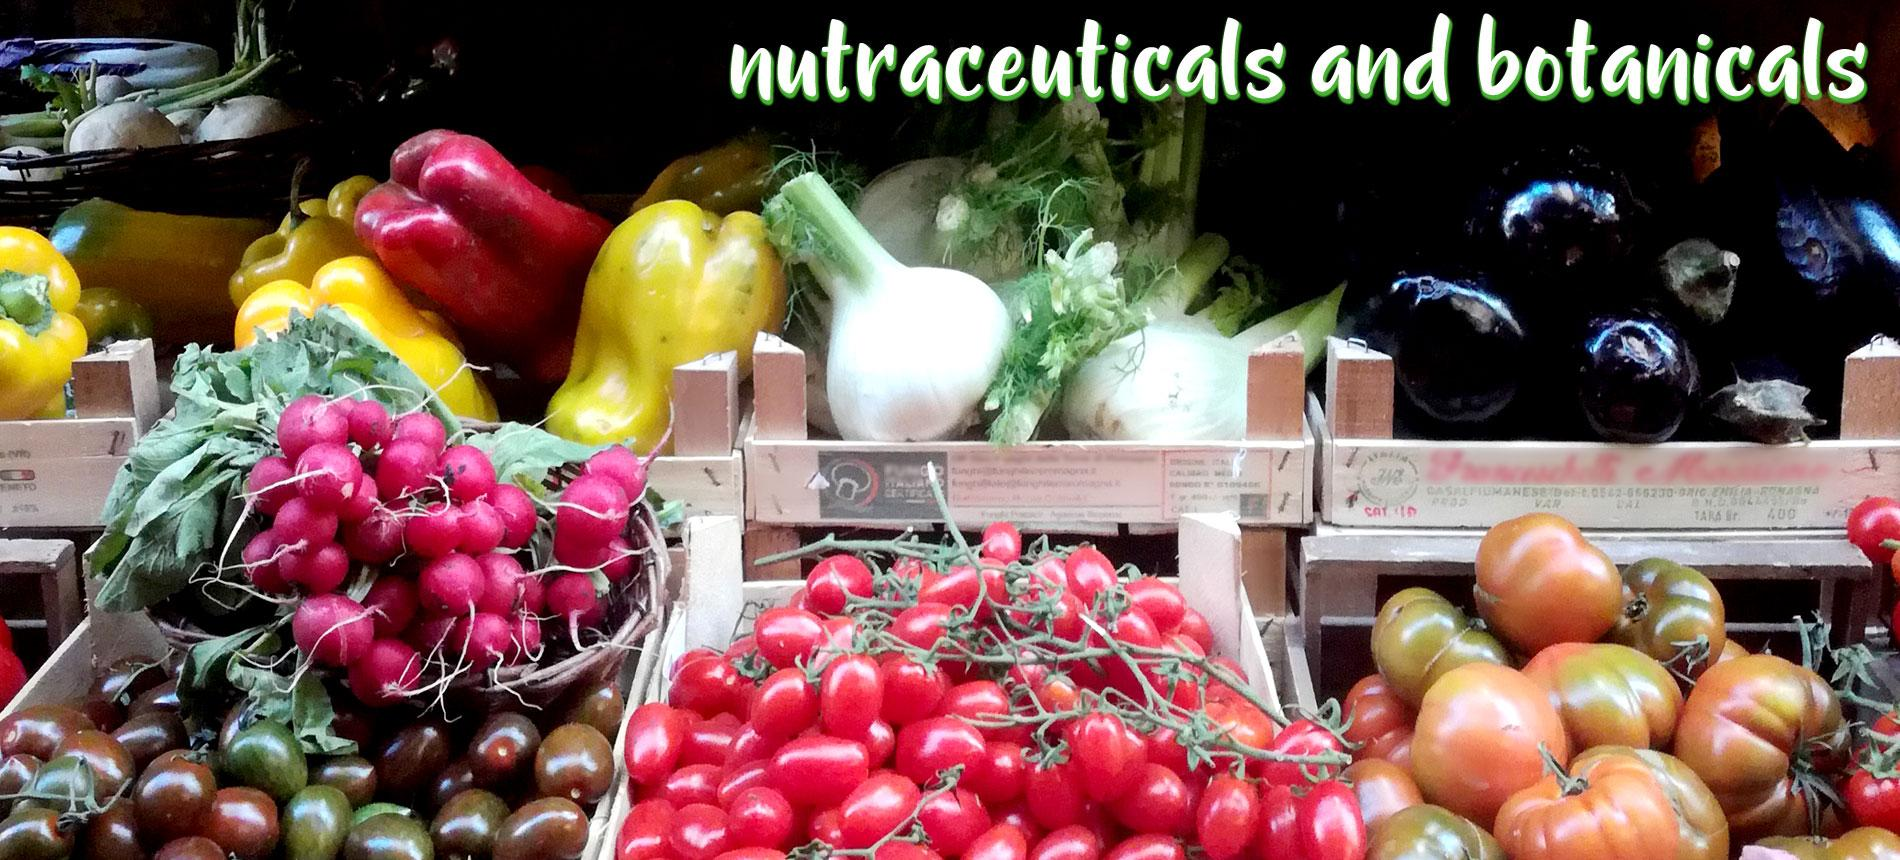 NUTRACEUTICALS AND BOTANICALS